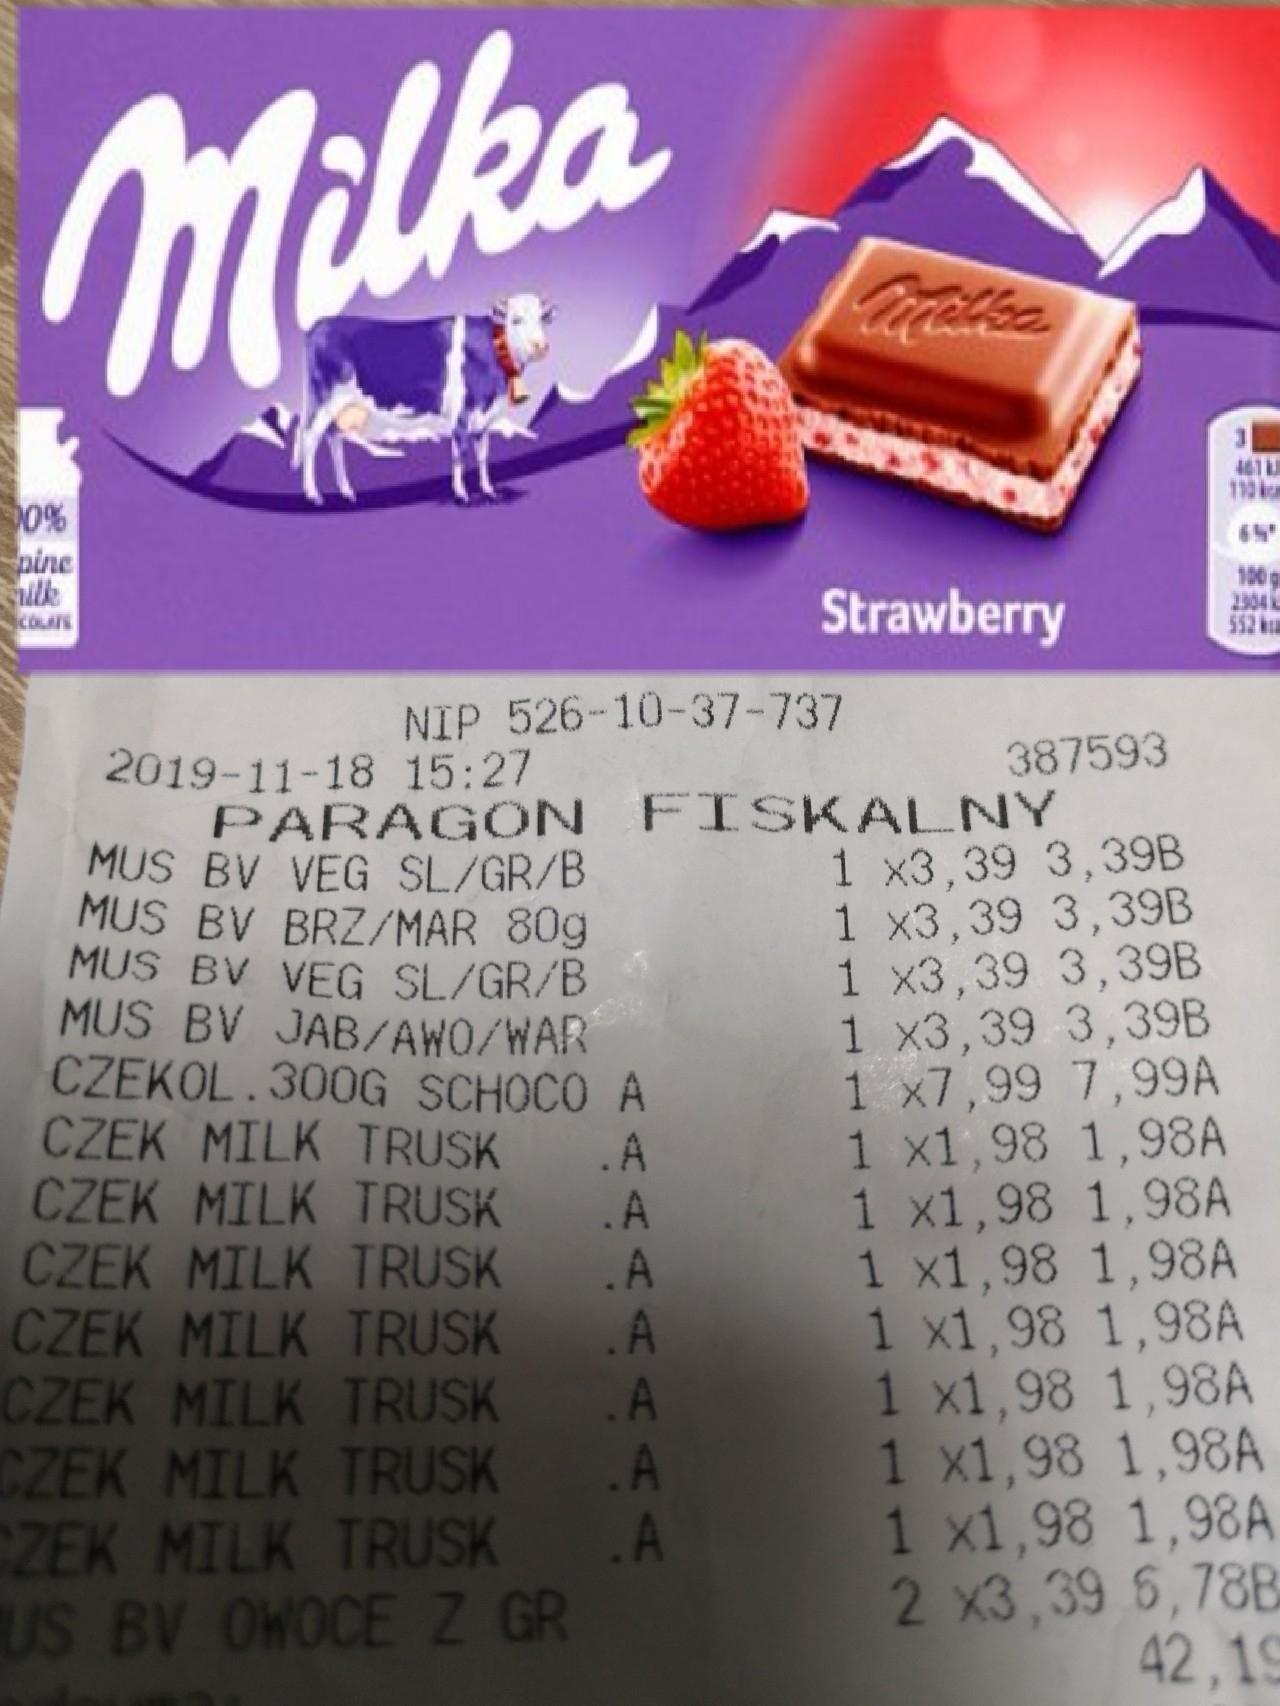 Czekolada Milka truskawkowa - Tesco